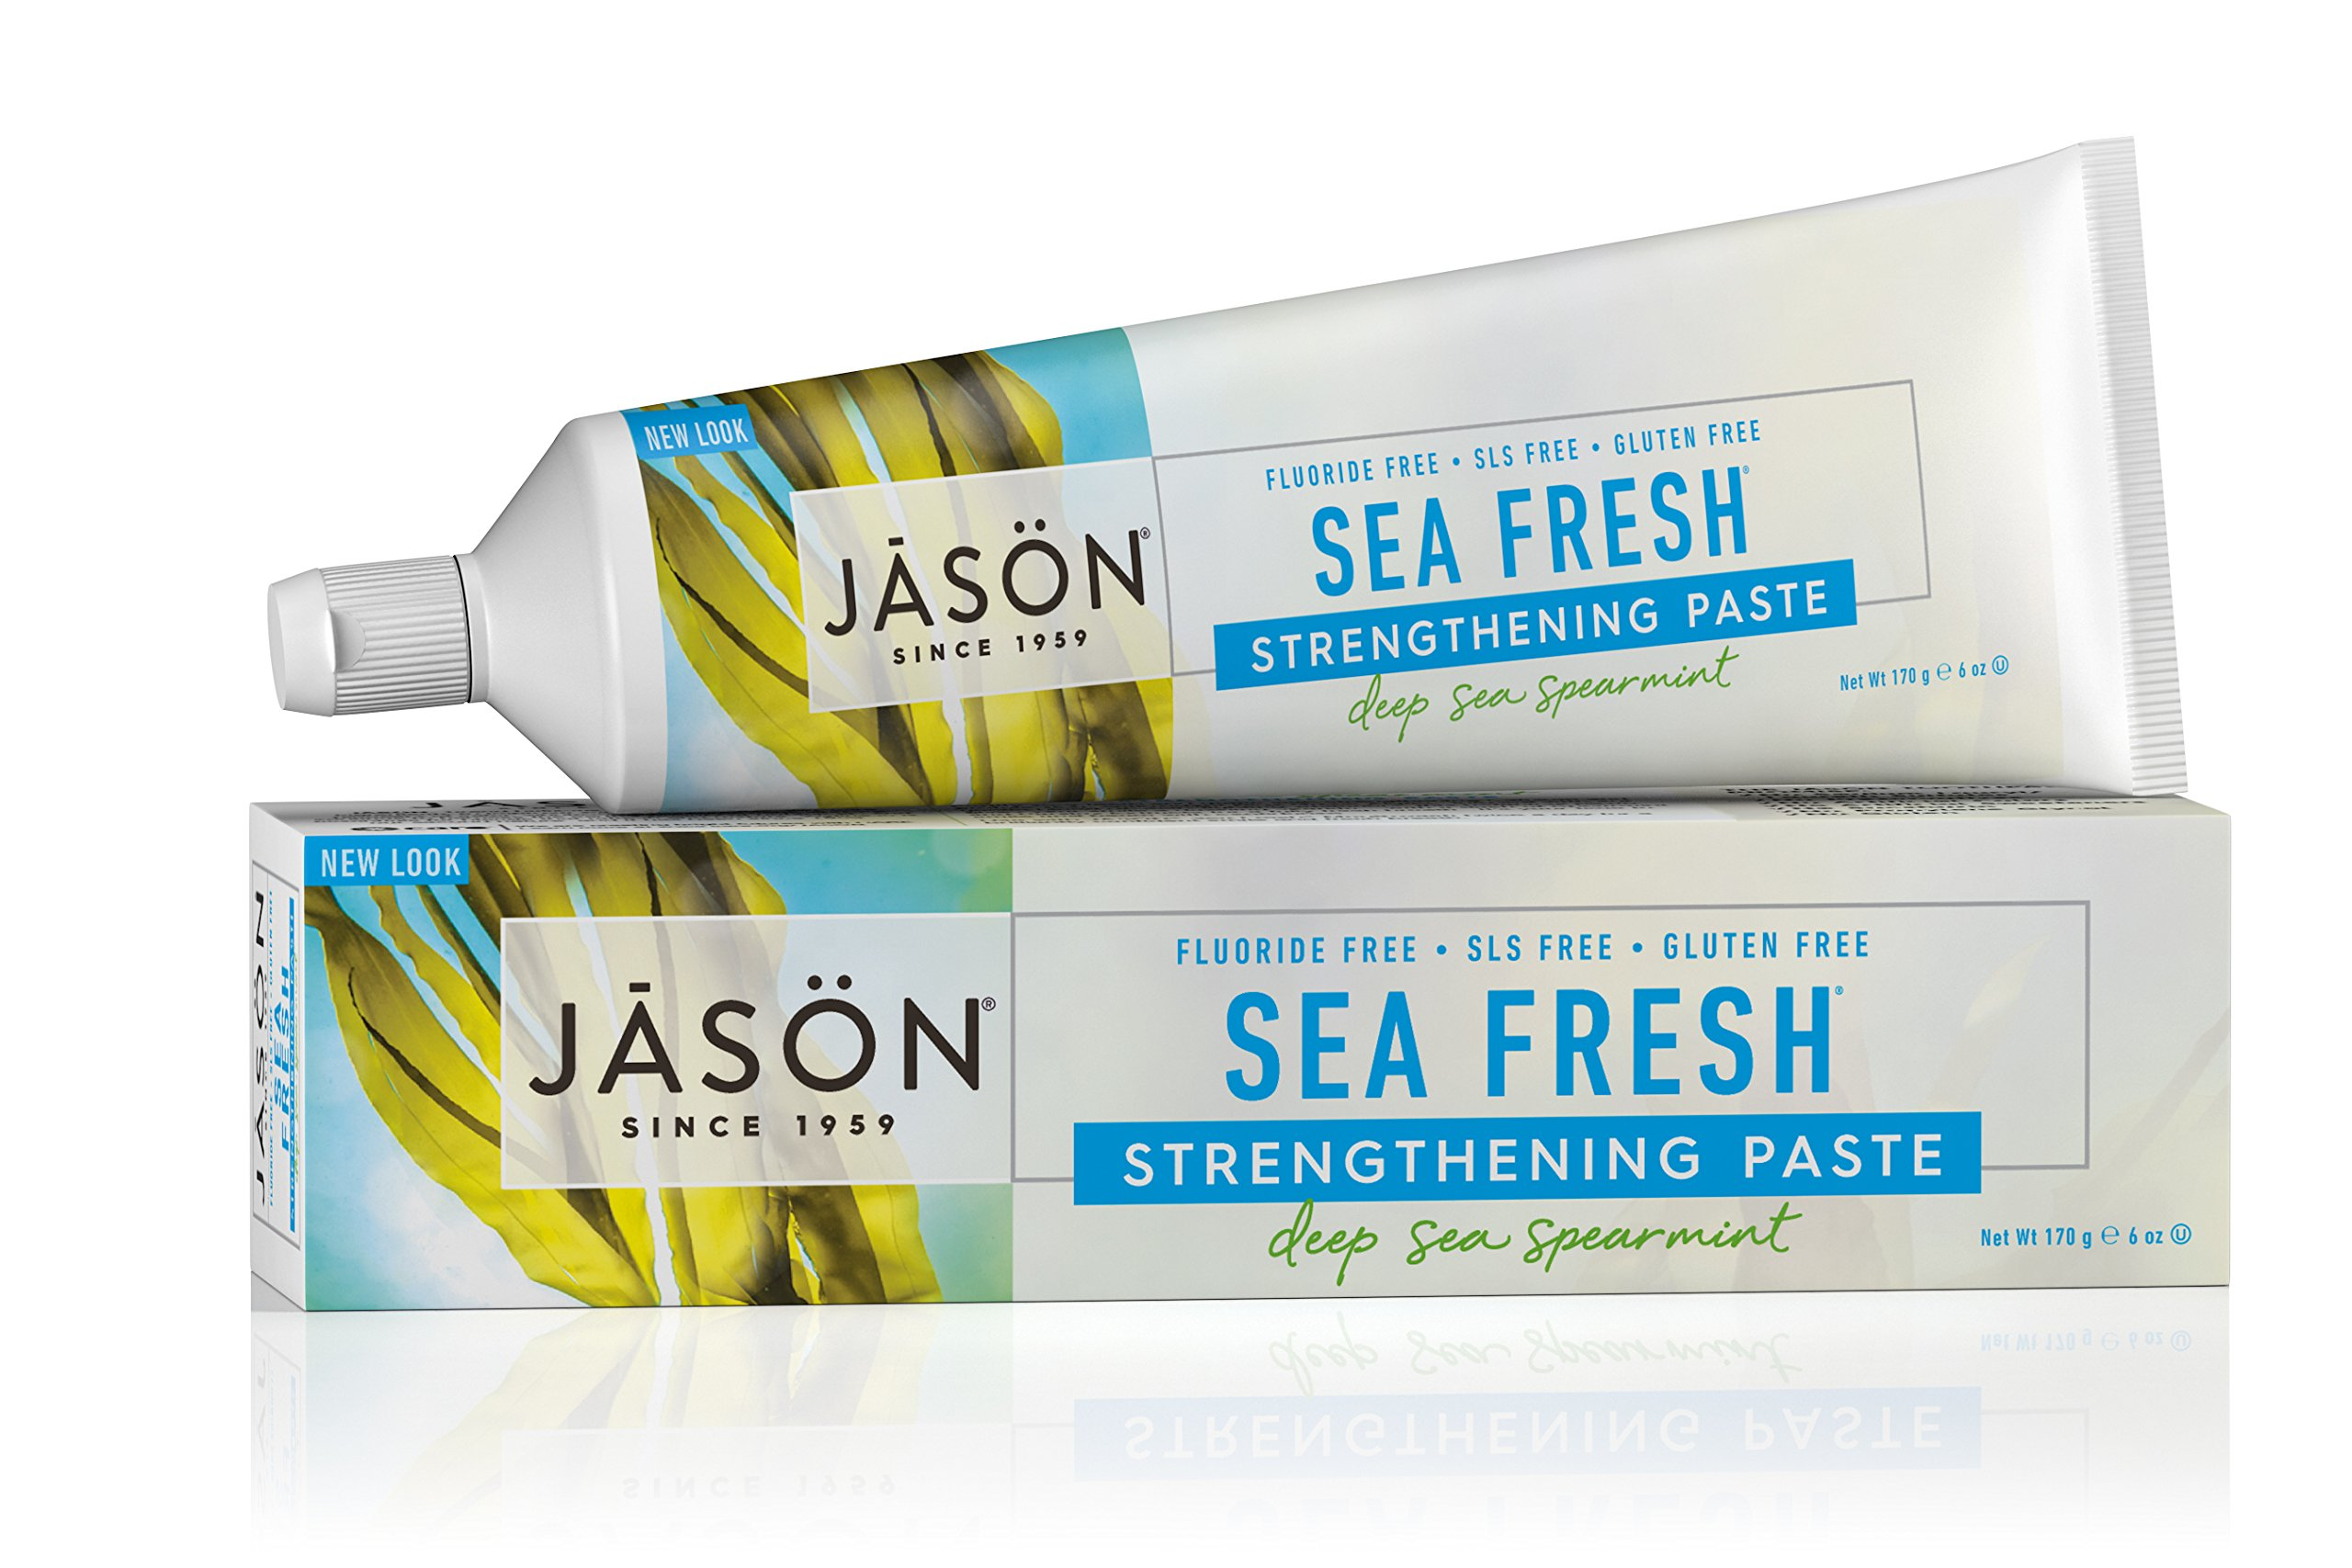 JASON Sea Fresh Strengthening Fluoride-Free Toothpaste, Deep Sea Spearmint, 6 oz. (Packaging May Vary)